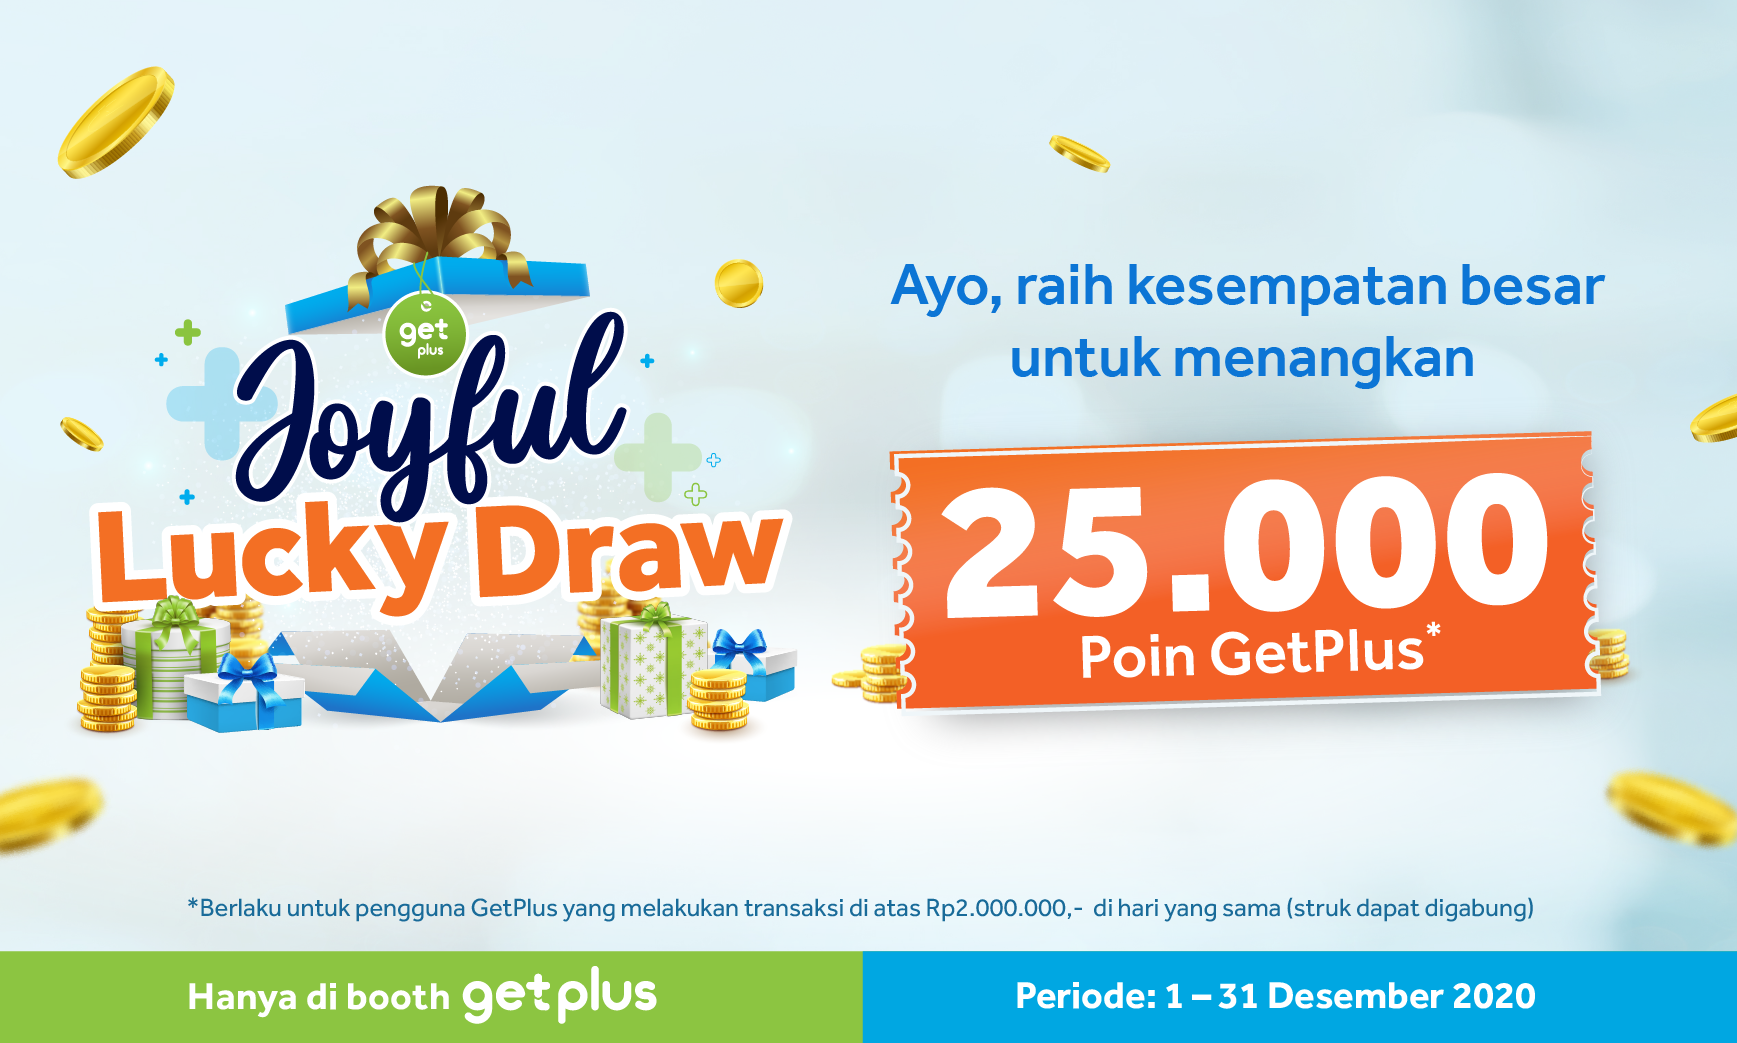 GetPlus Joyful Lucky Draw